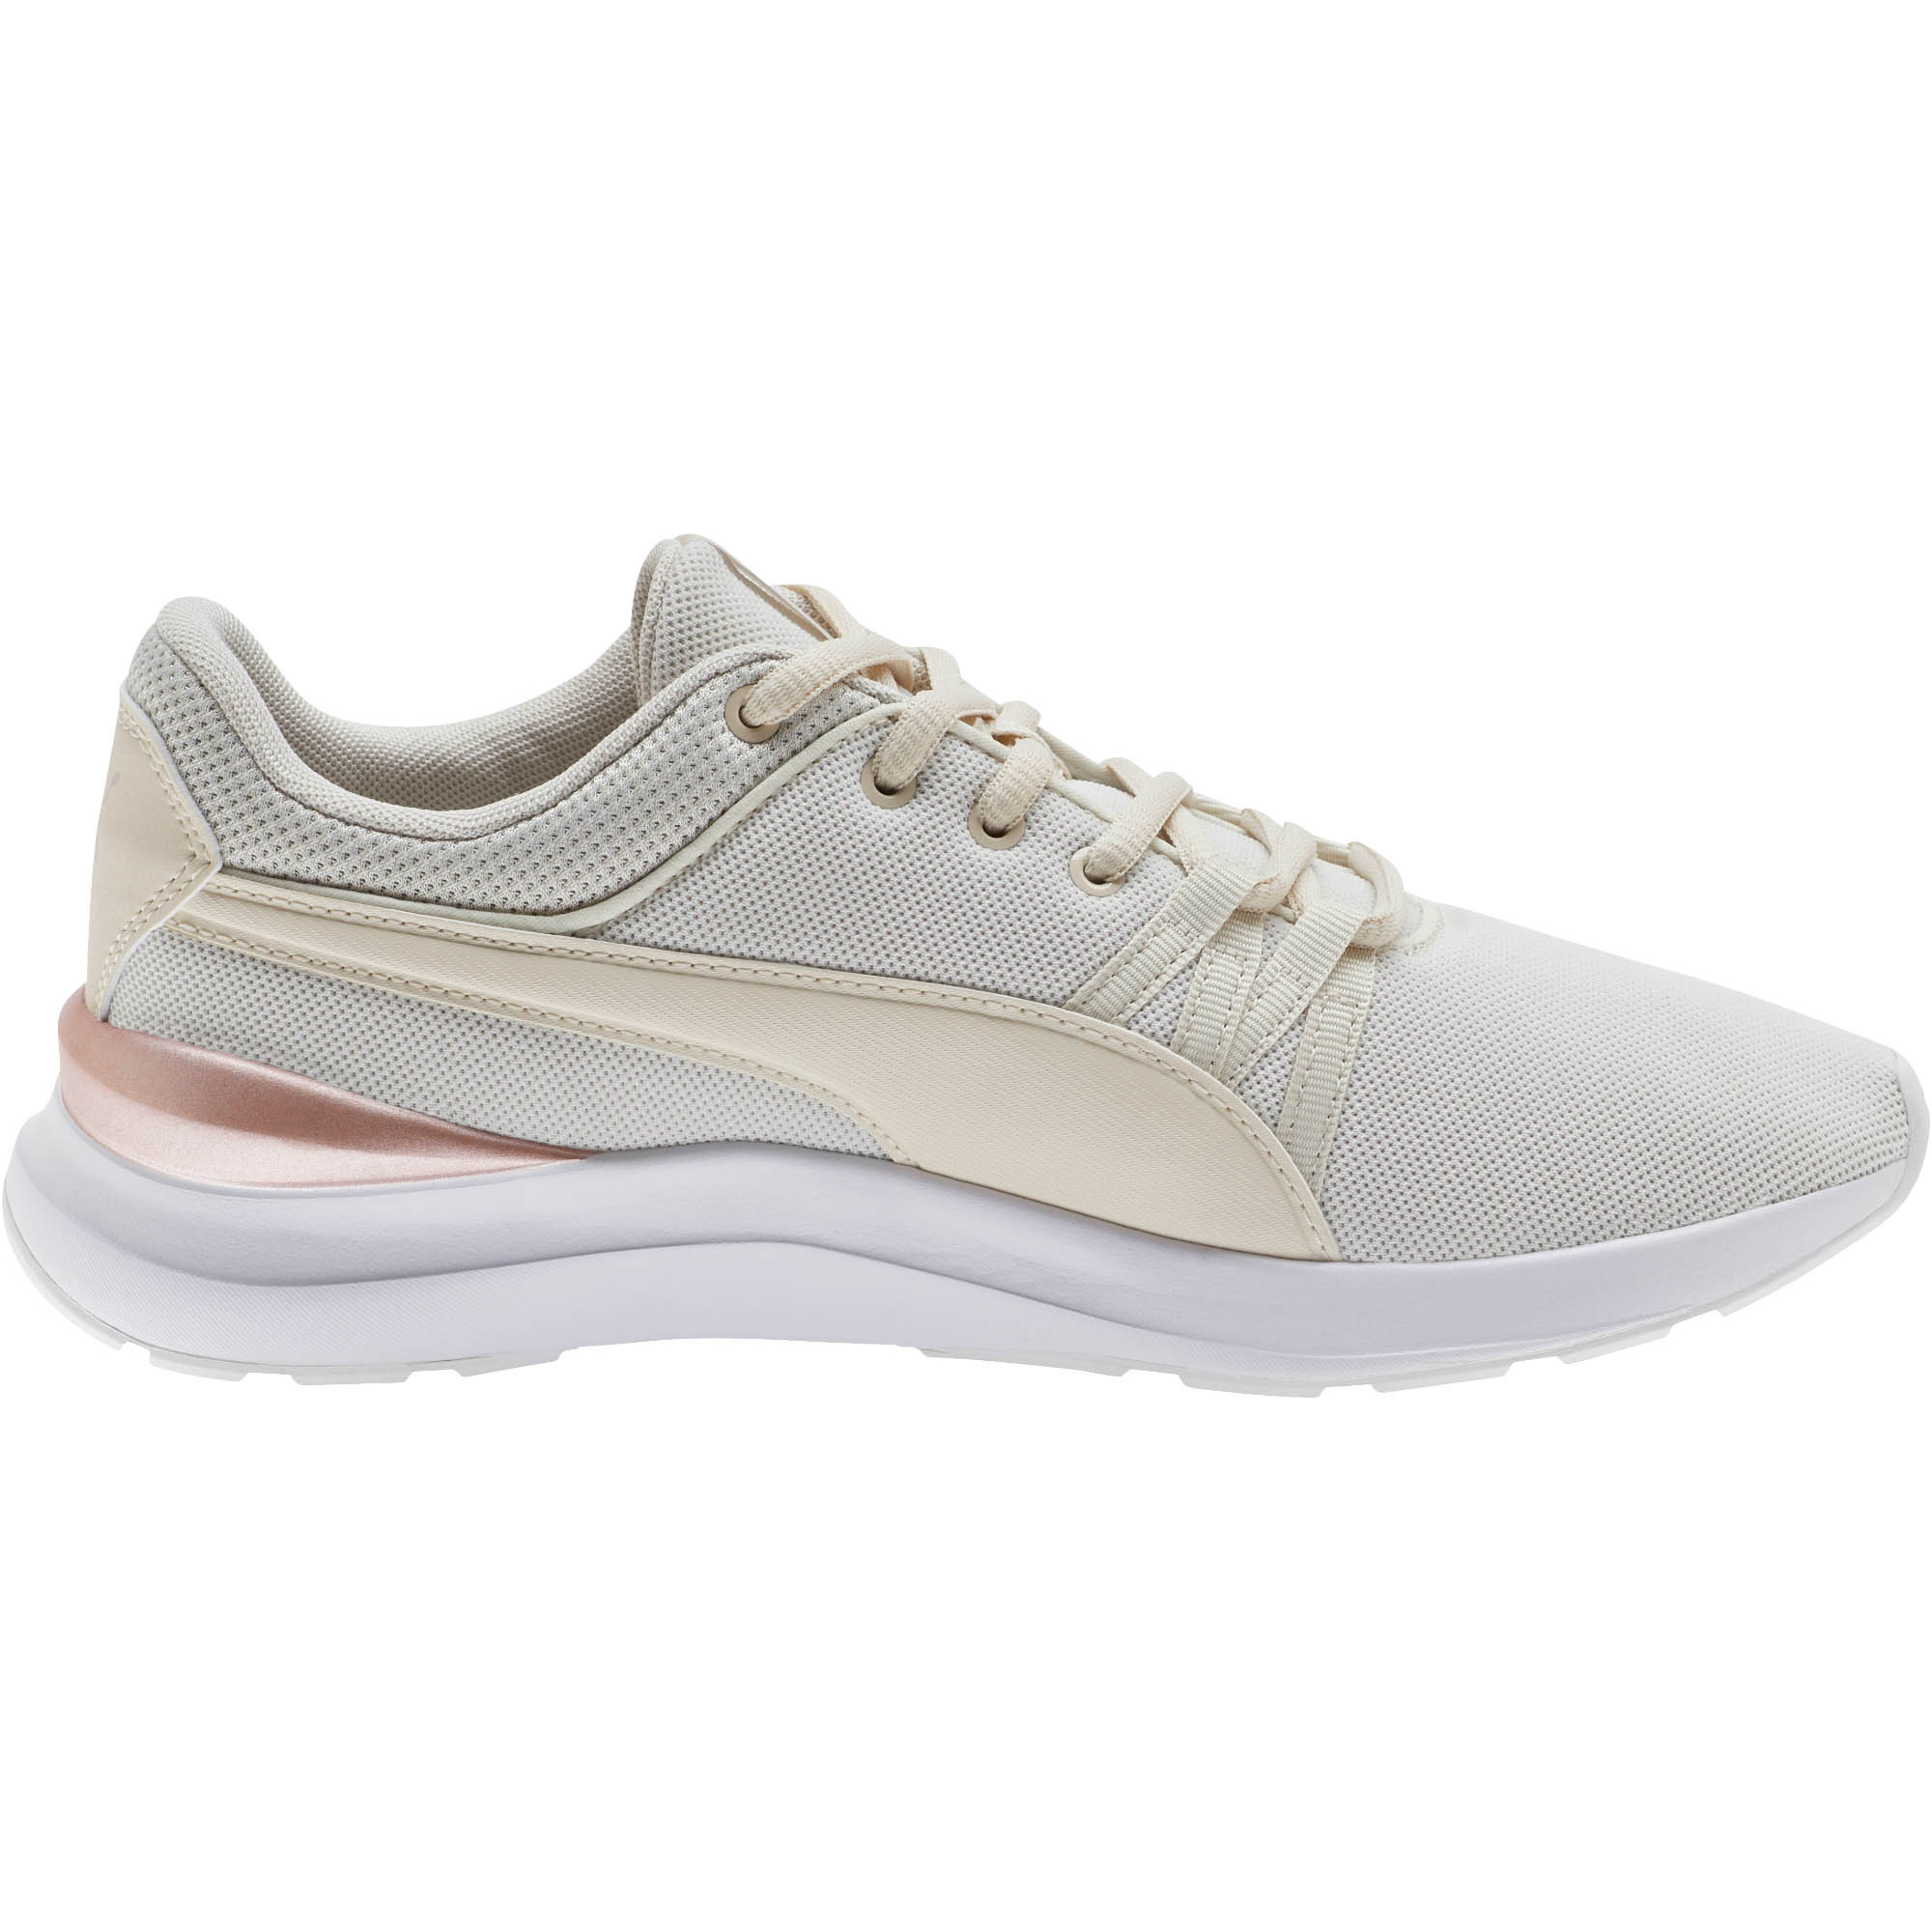 PUMA-Adela-Mesh-Women-s-Sneakers-Women-Shoe-Basics thumbnail 15